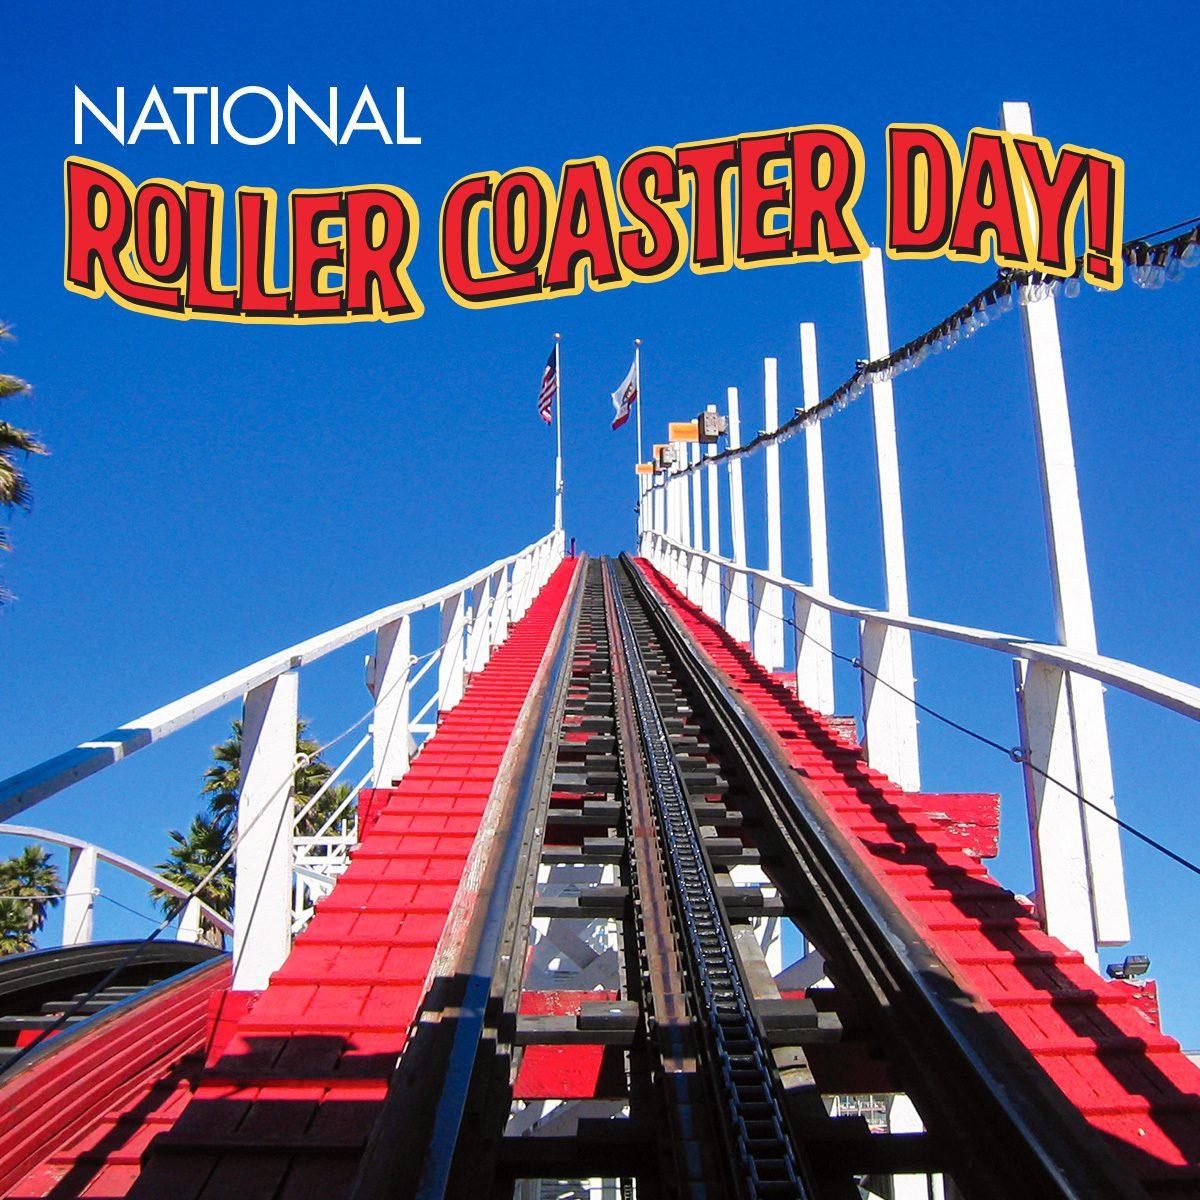 boardwalk-roller-coaster-day